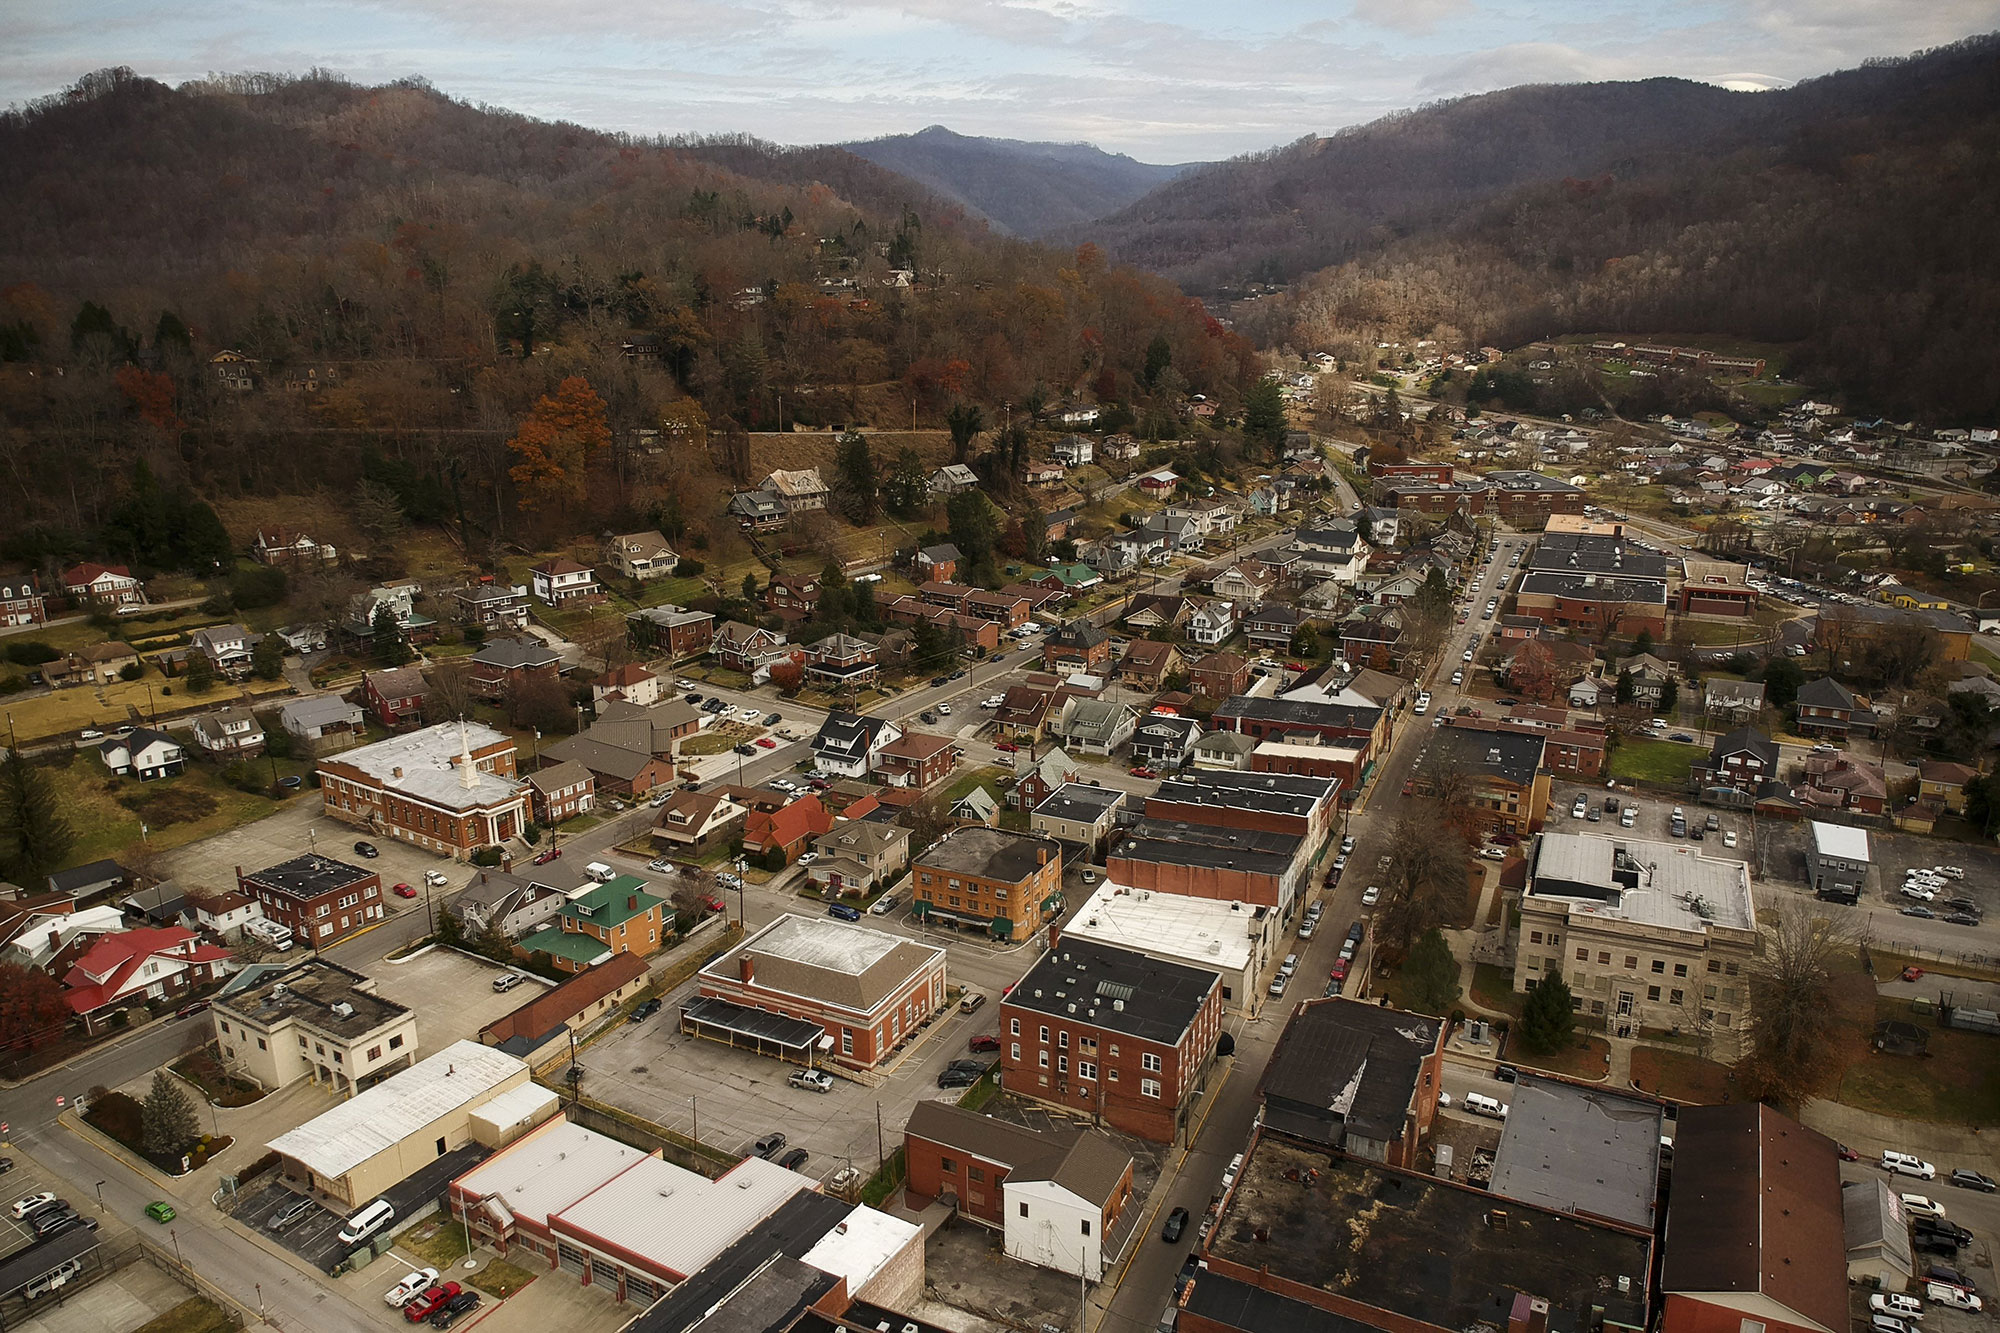 An aerial view of Harlan, Ky., on Thursday, Nov. 28, 2018. Photo by Alex Slitz / aslitz@herald-leader.com